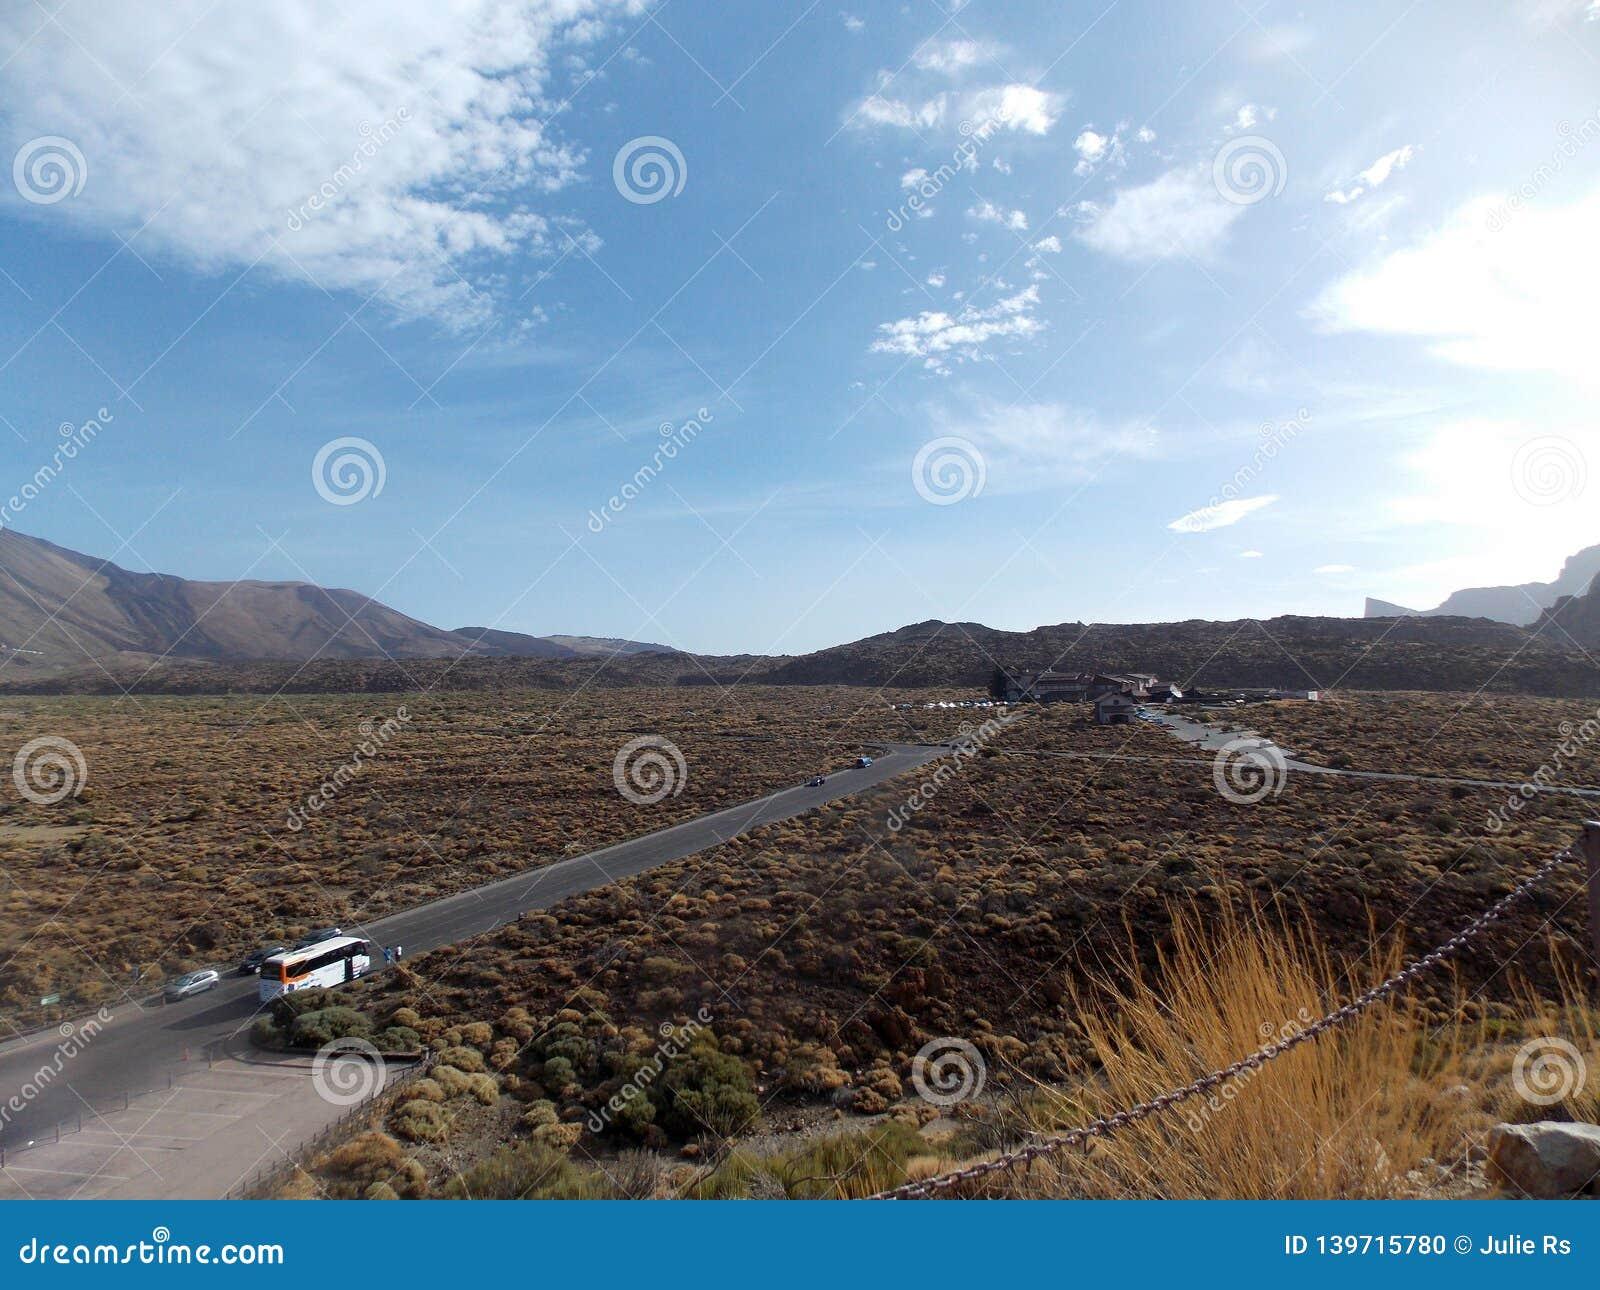 Beautiful view, Teide, Tenerife